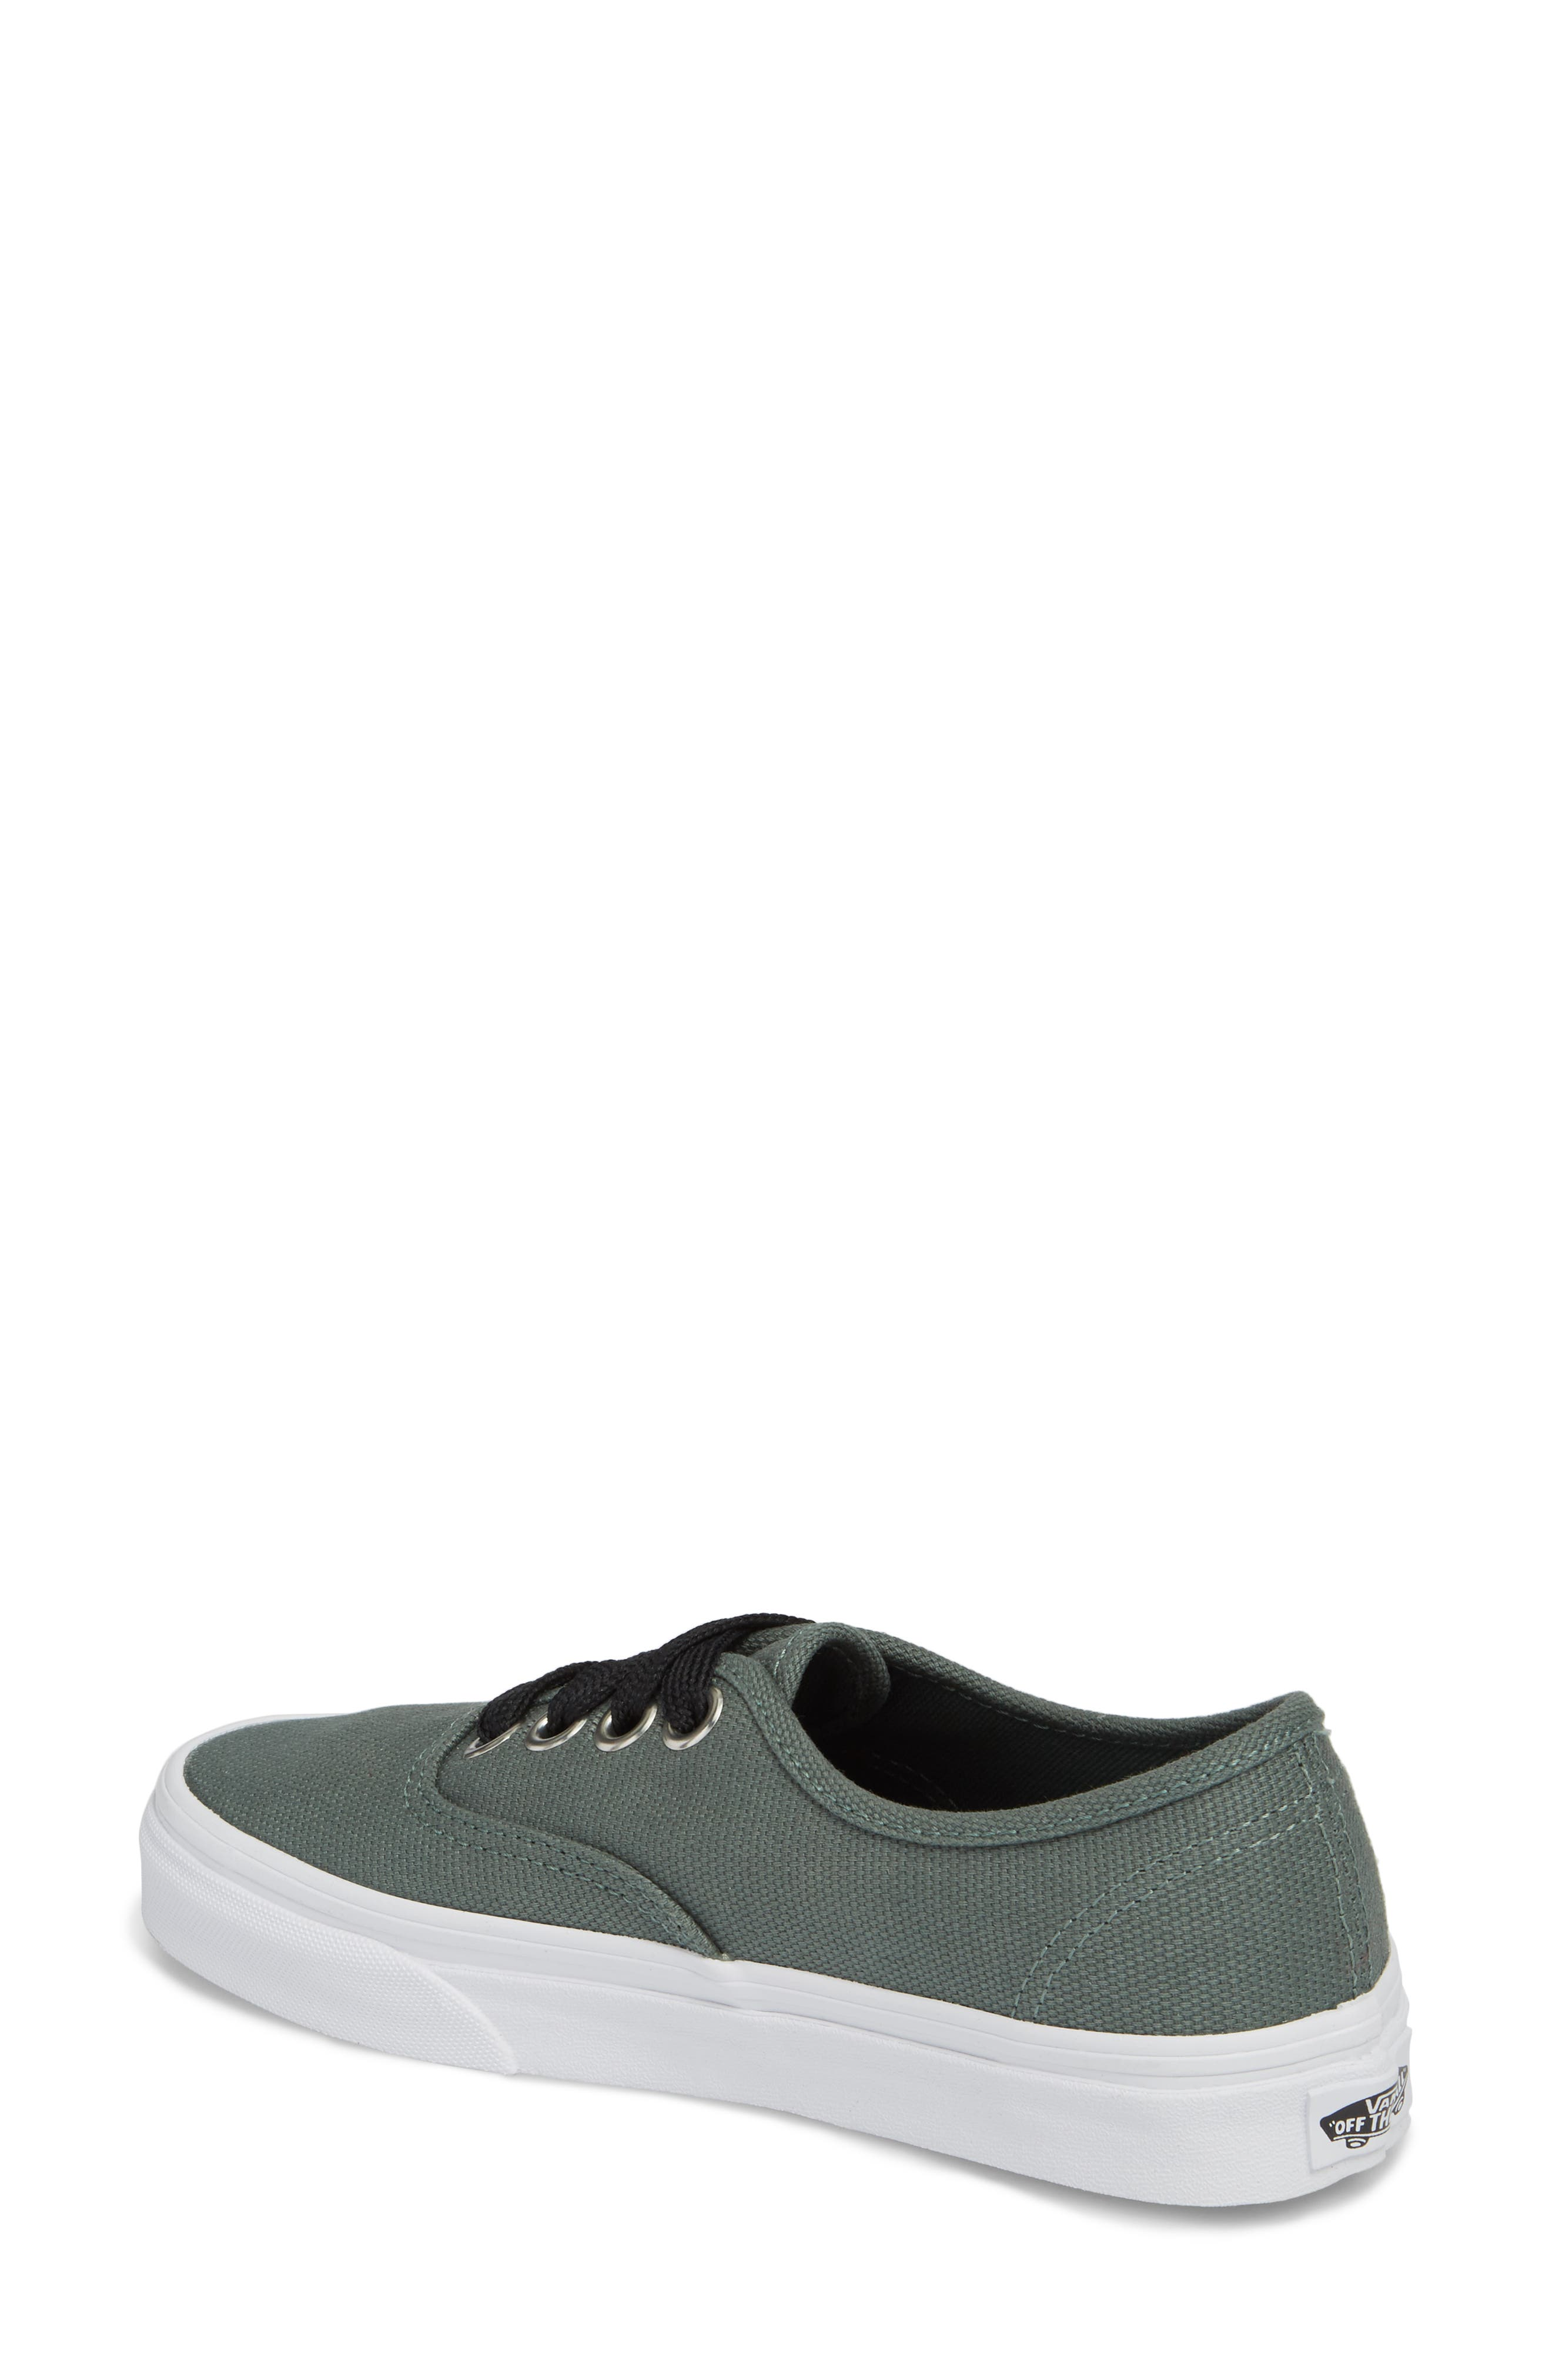 ,                             'Authentic' Sneaker,                             Alternate thumbnail 263, color,                             304